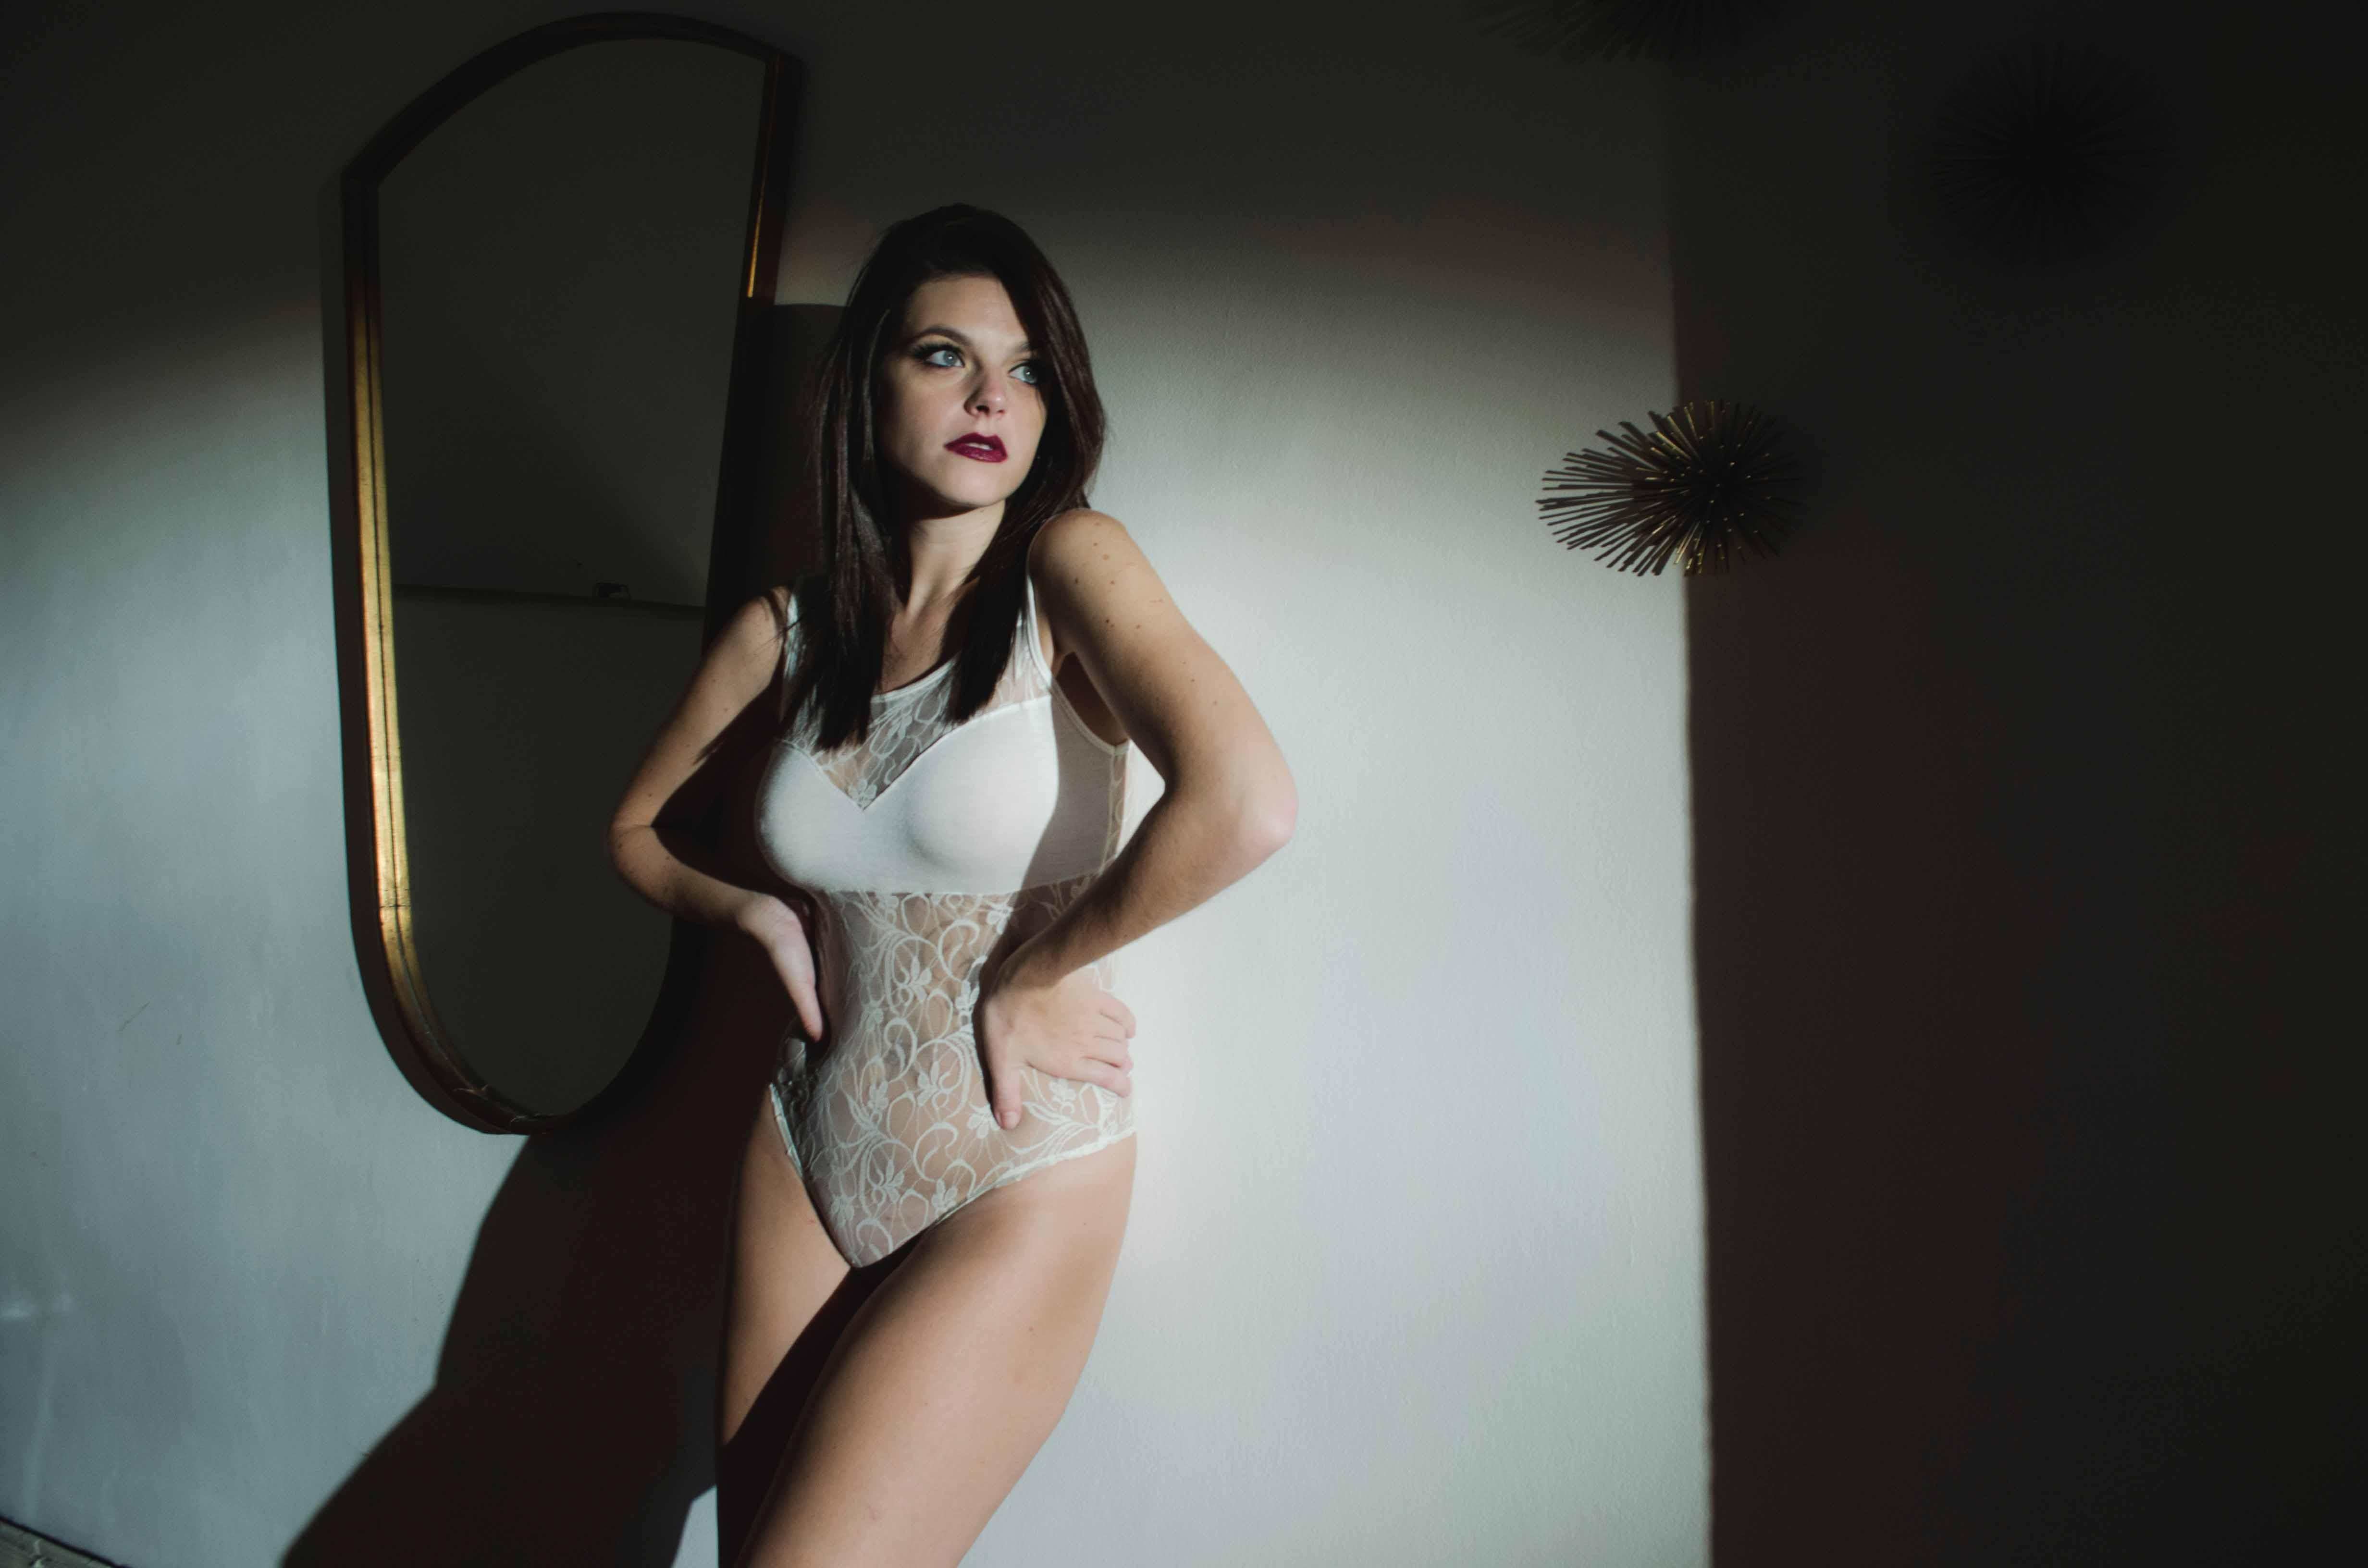 Hackney Escorts sexy body girl